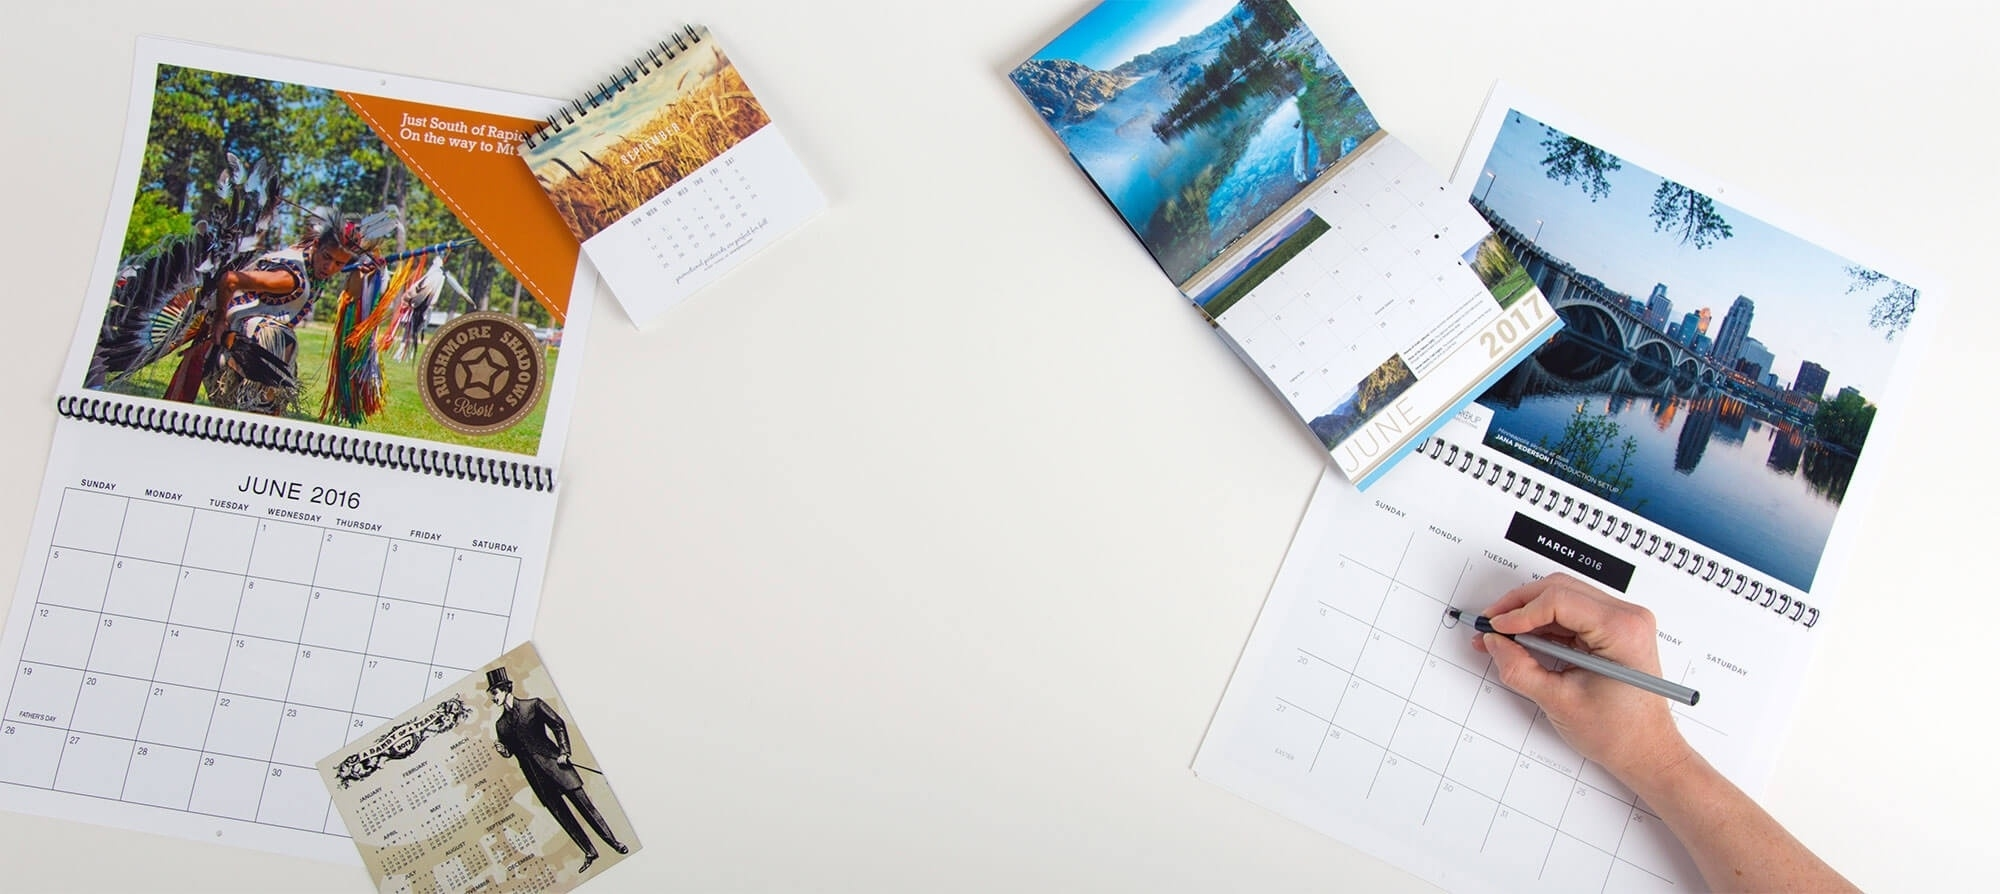 Calendar Printing Companies Near Me • Printable Blank Calendar Template_The Calendar Printing Company